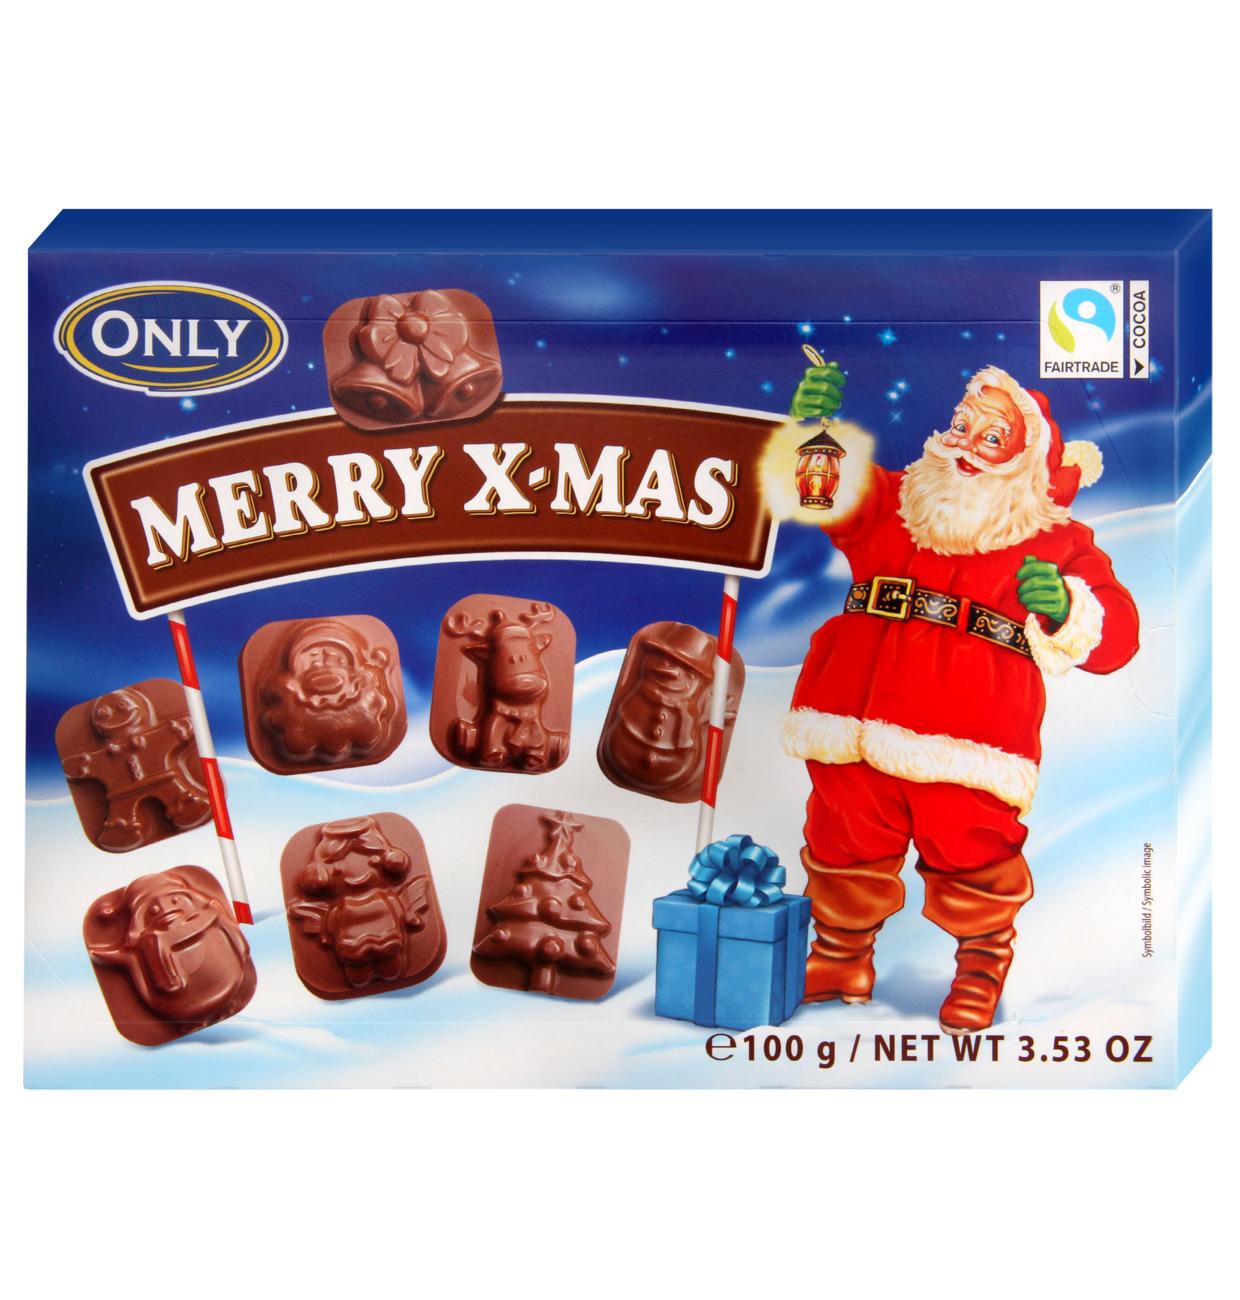 Vollmilchschokolade Merry X-mas Figuren